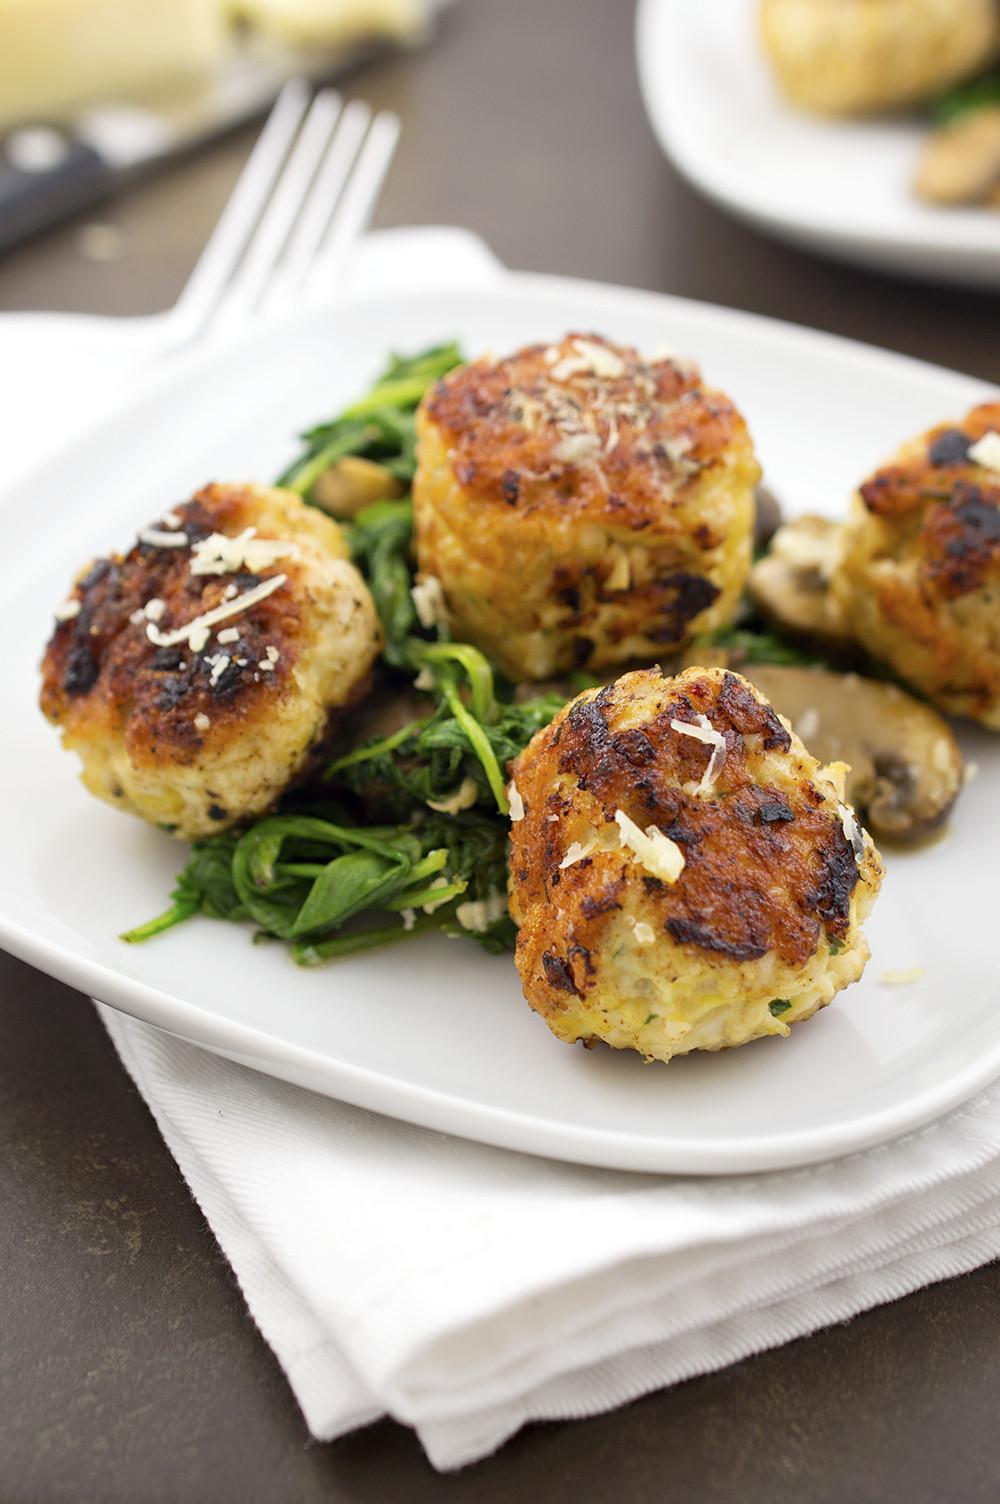 Thanksgiving Turkey Meatballs  Turkey Meatballs With Arugula and Mushrooms